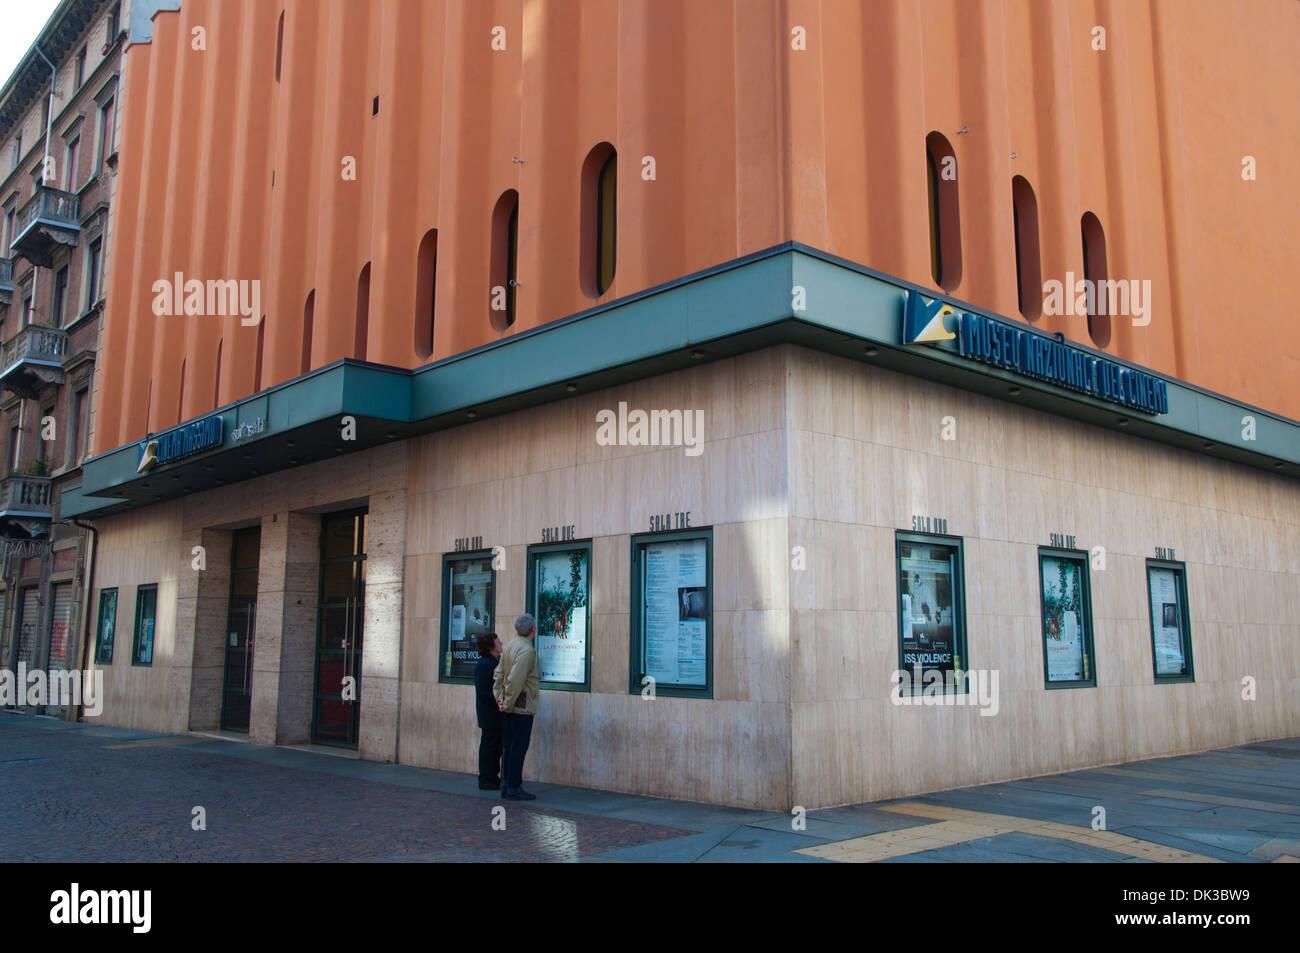 Cinema Massimo, Turin city Piedmont region northern Italy Europe - Stock Image